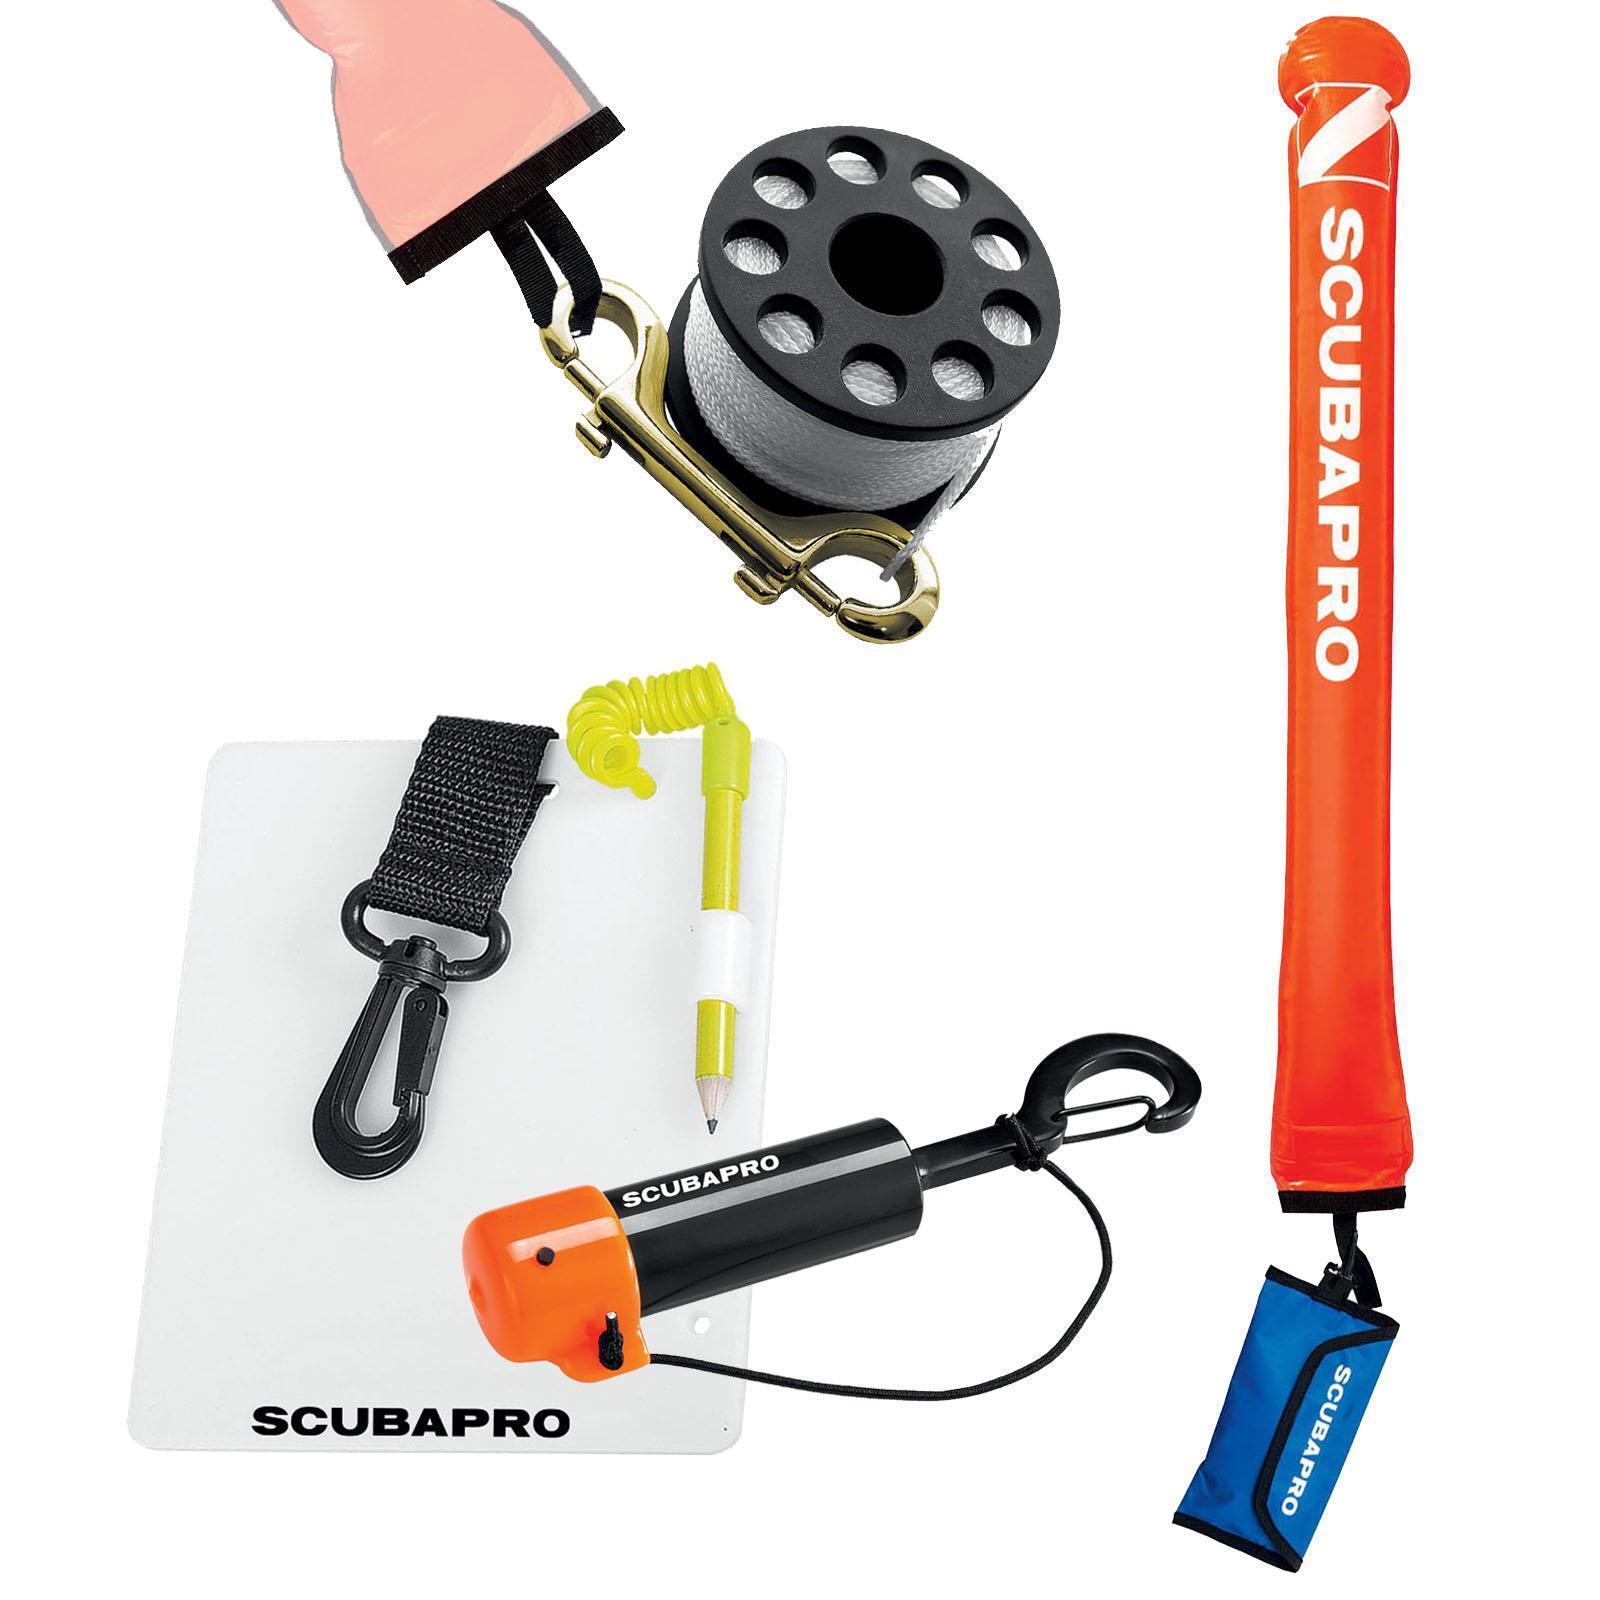 Scubapro Sicherheits-Set - DekoBoje, Reel, UW-Shaker, UW-Schreibtafel  | Verkauf